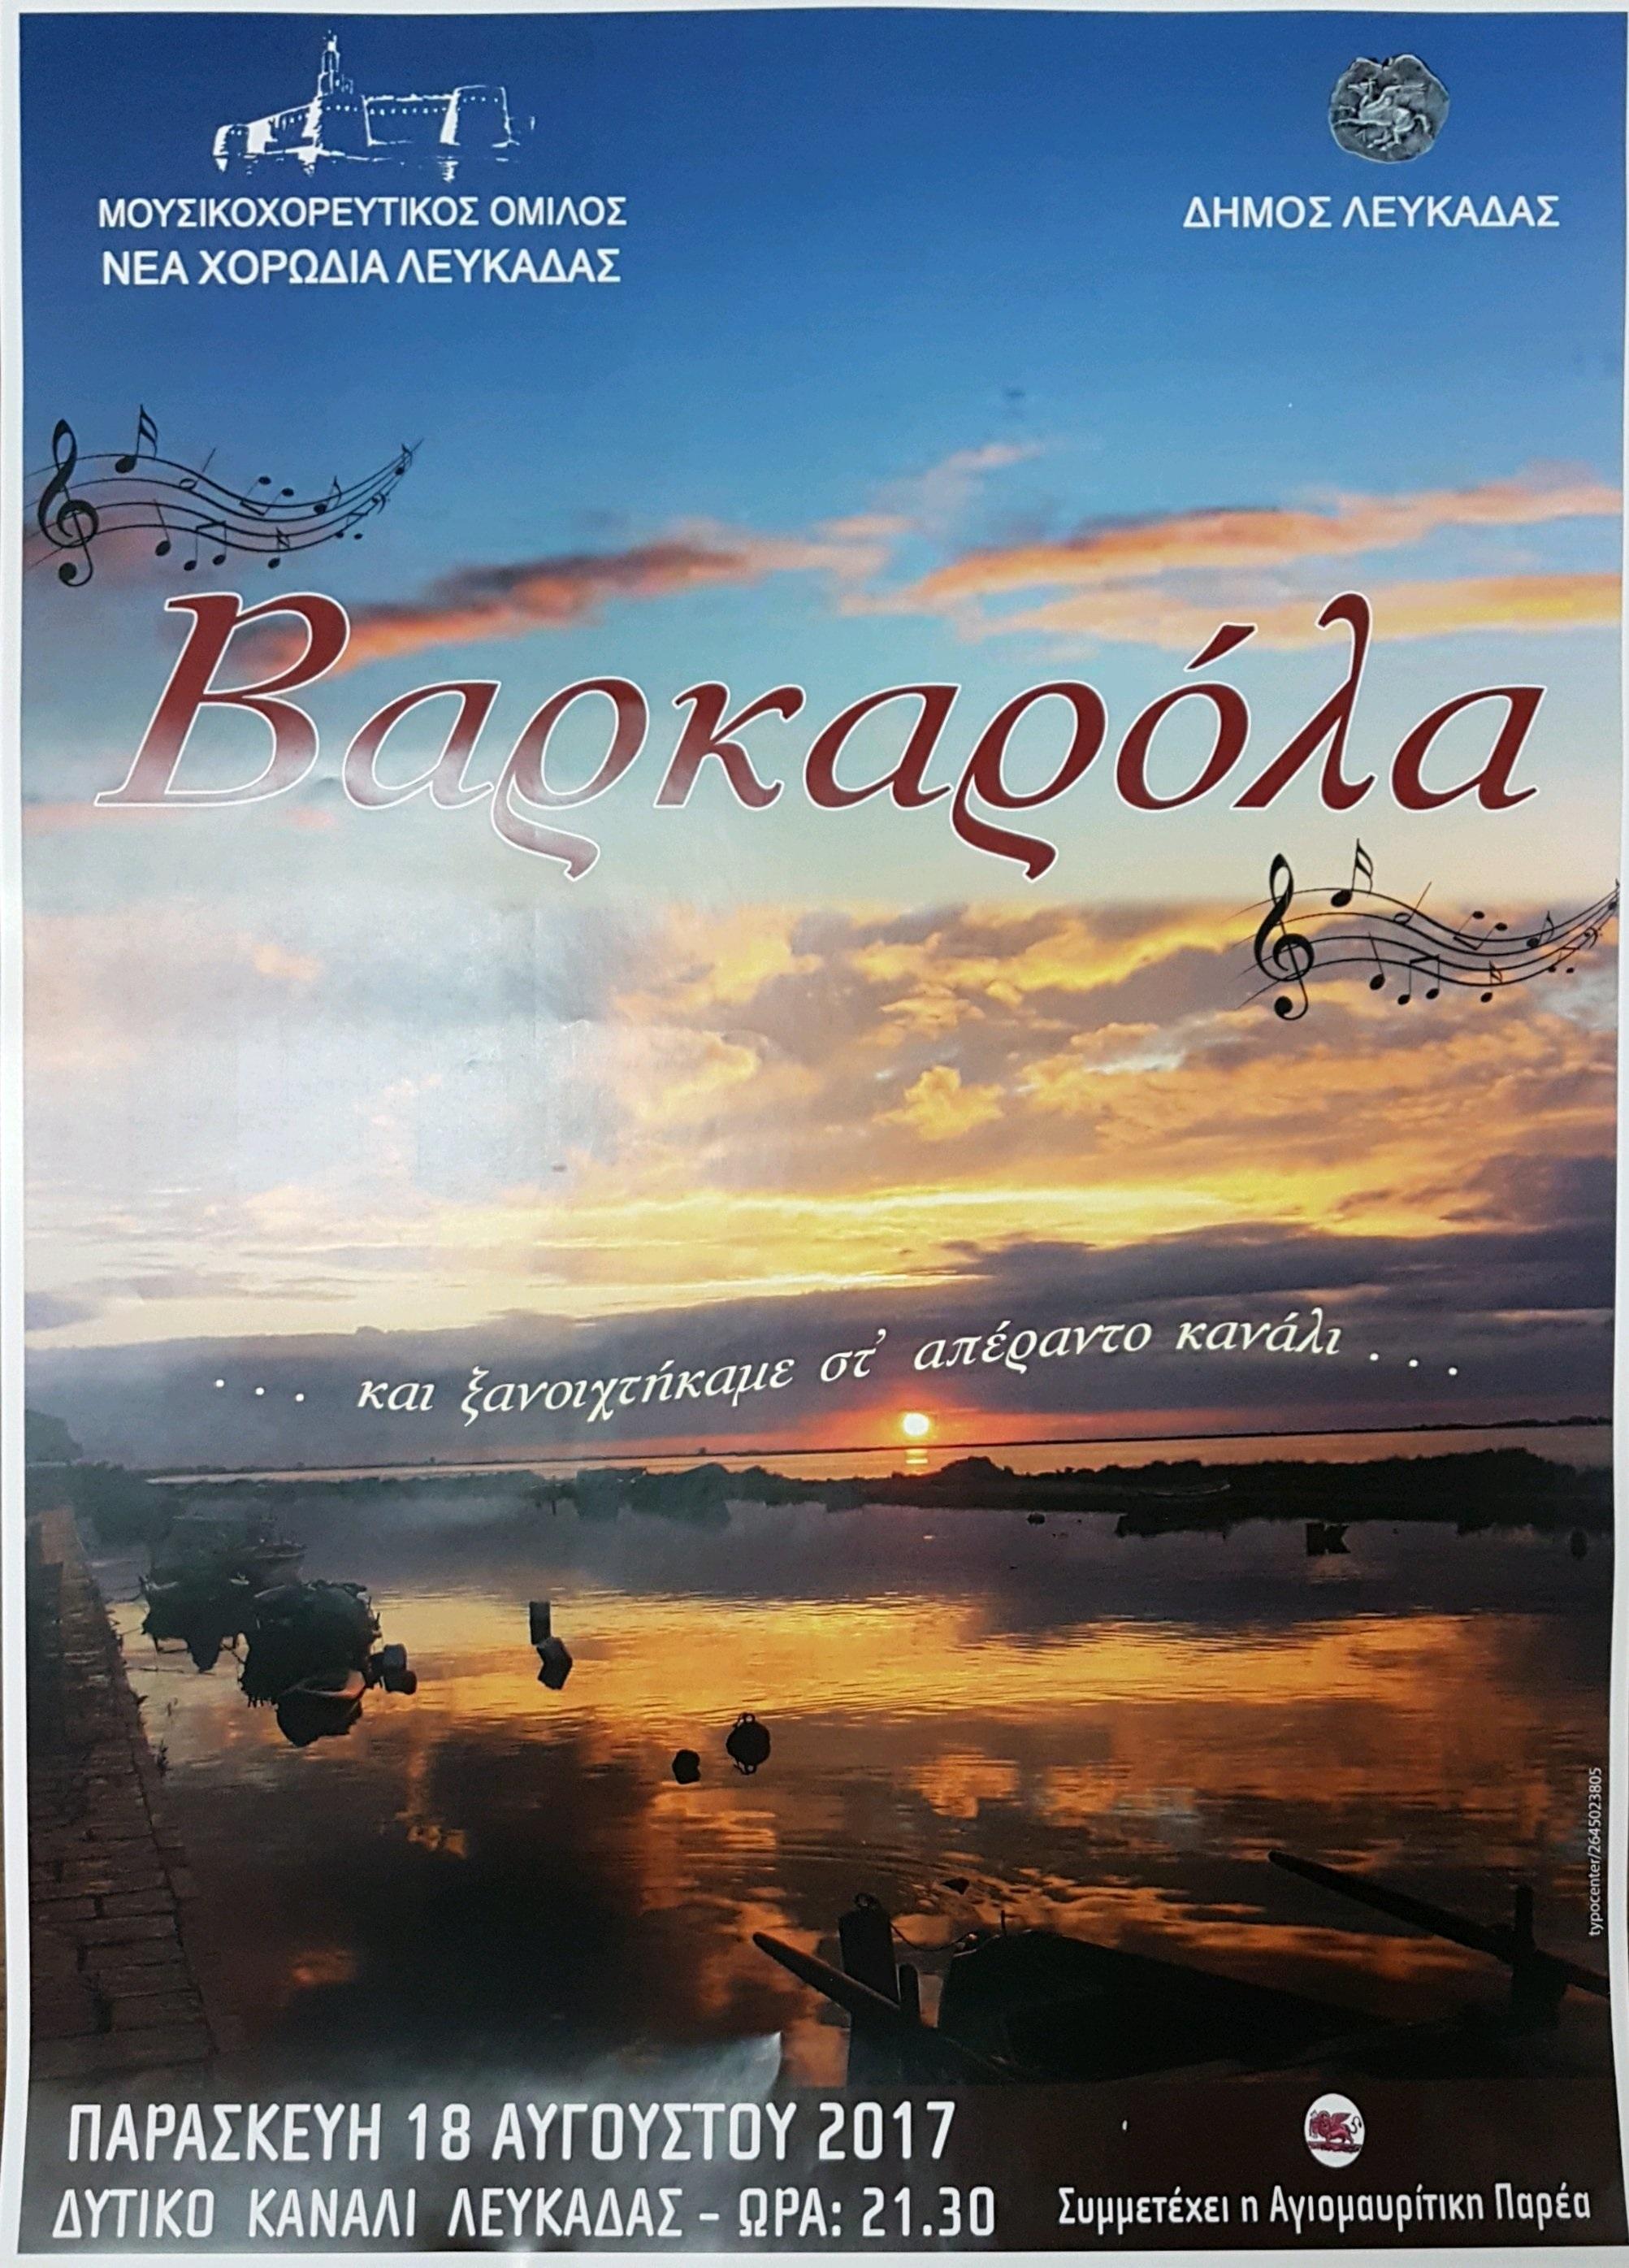 http://www.kolivas.de/wp-content/uploads/2017/08/varkarola_nea_chorodia.jpg